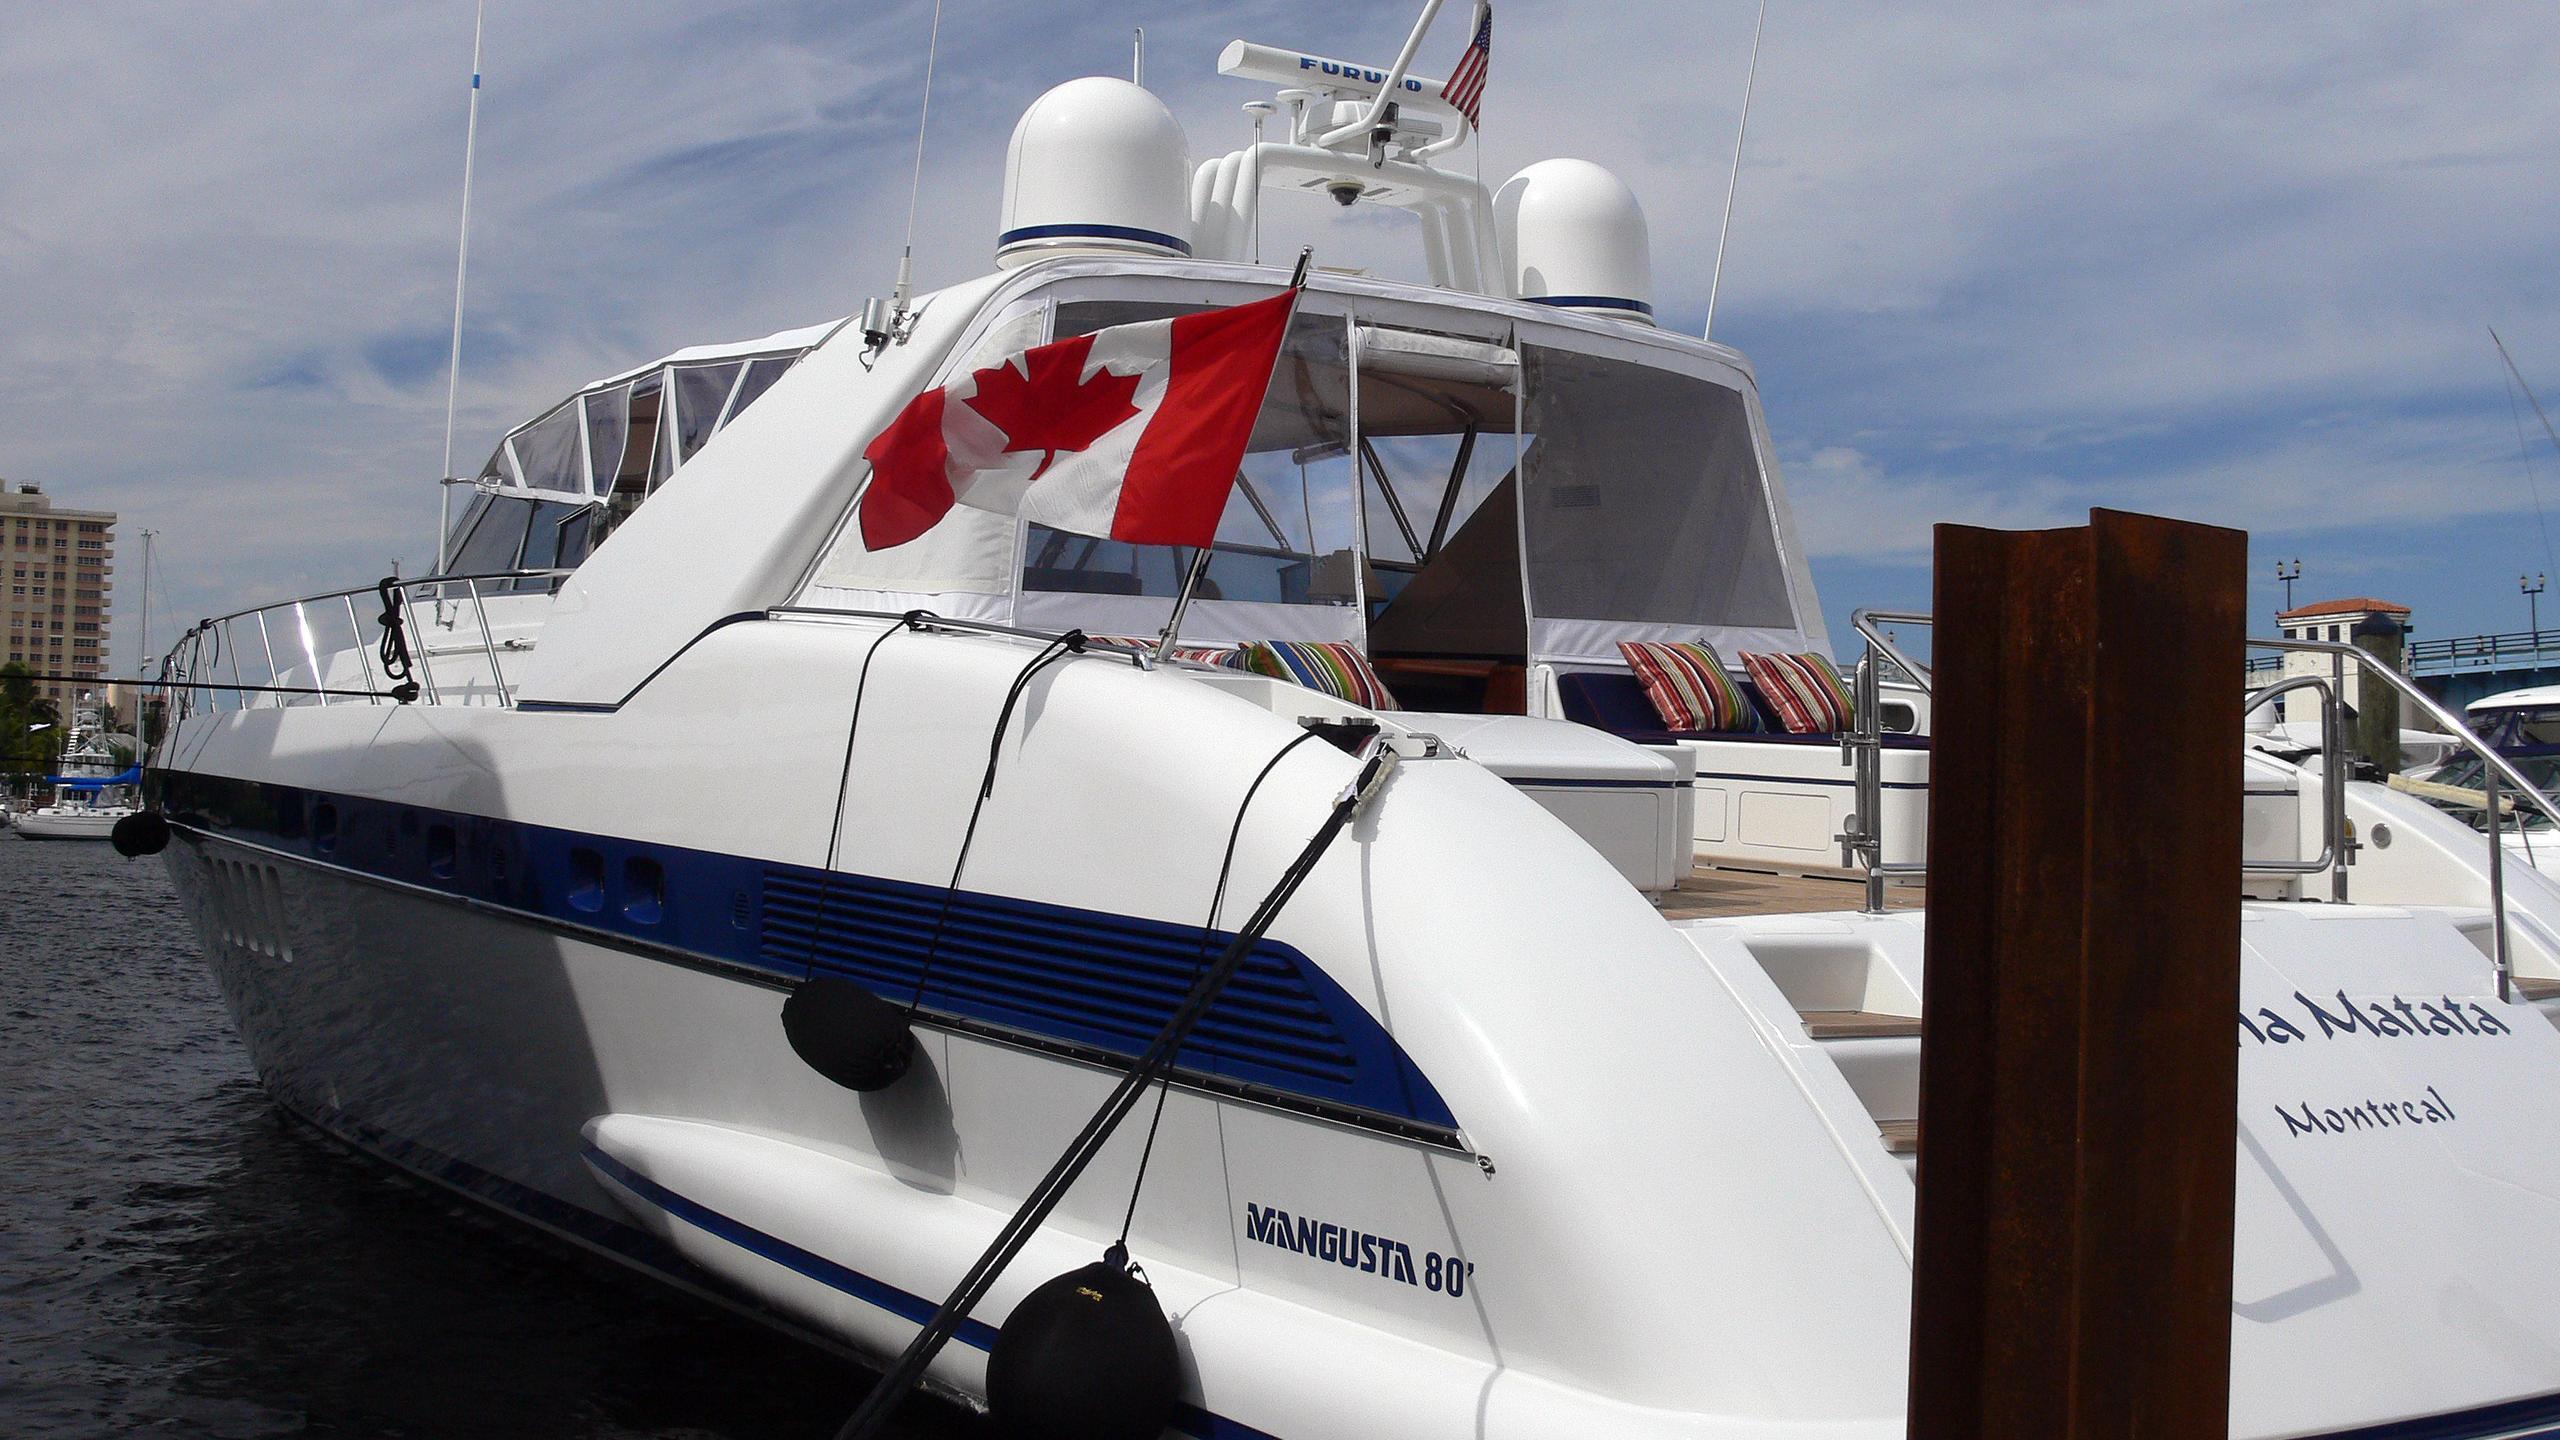 hakuna-matata-ii-motor-yacht-overmarine-mangusta-80-open-2000-25m-rear-profile